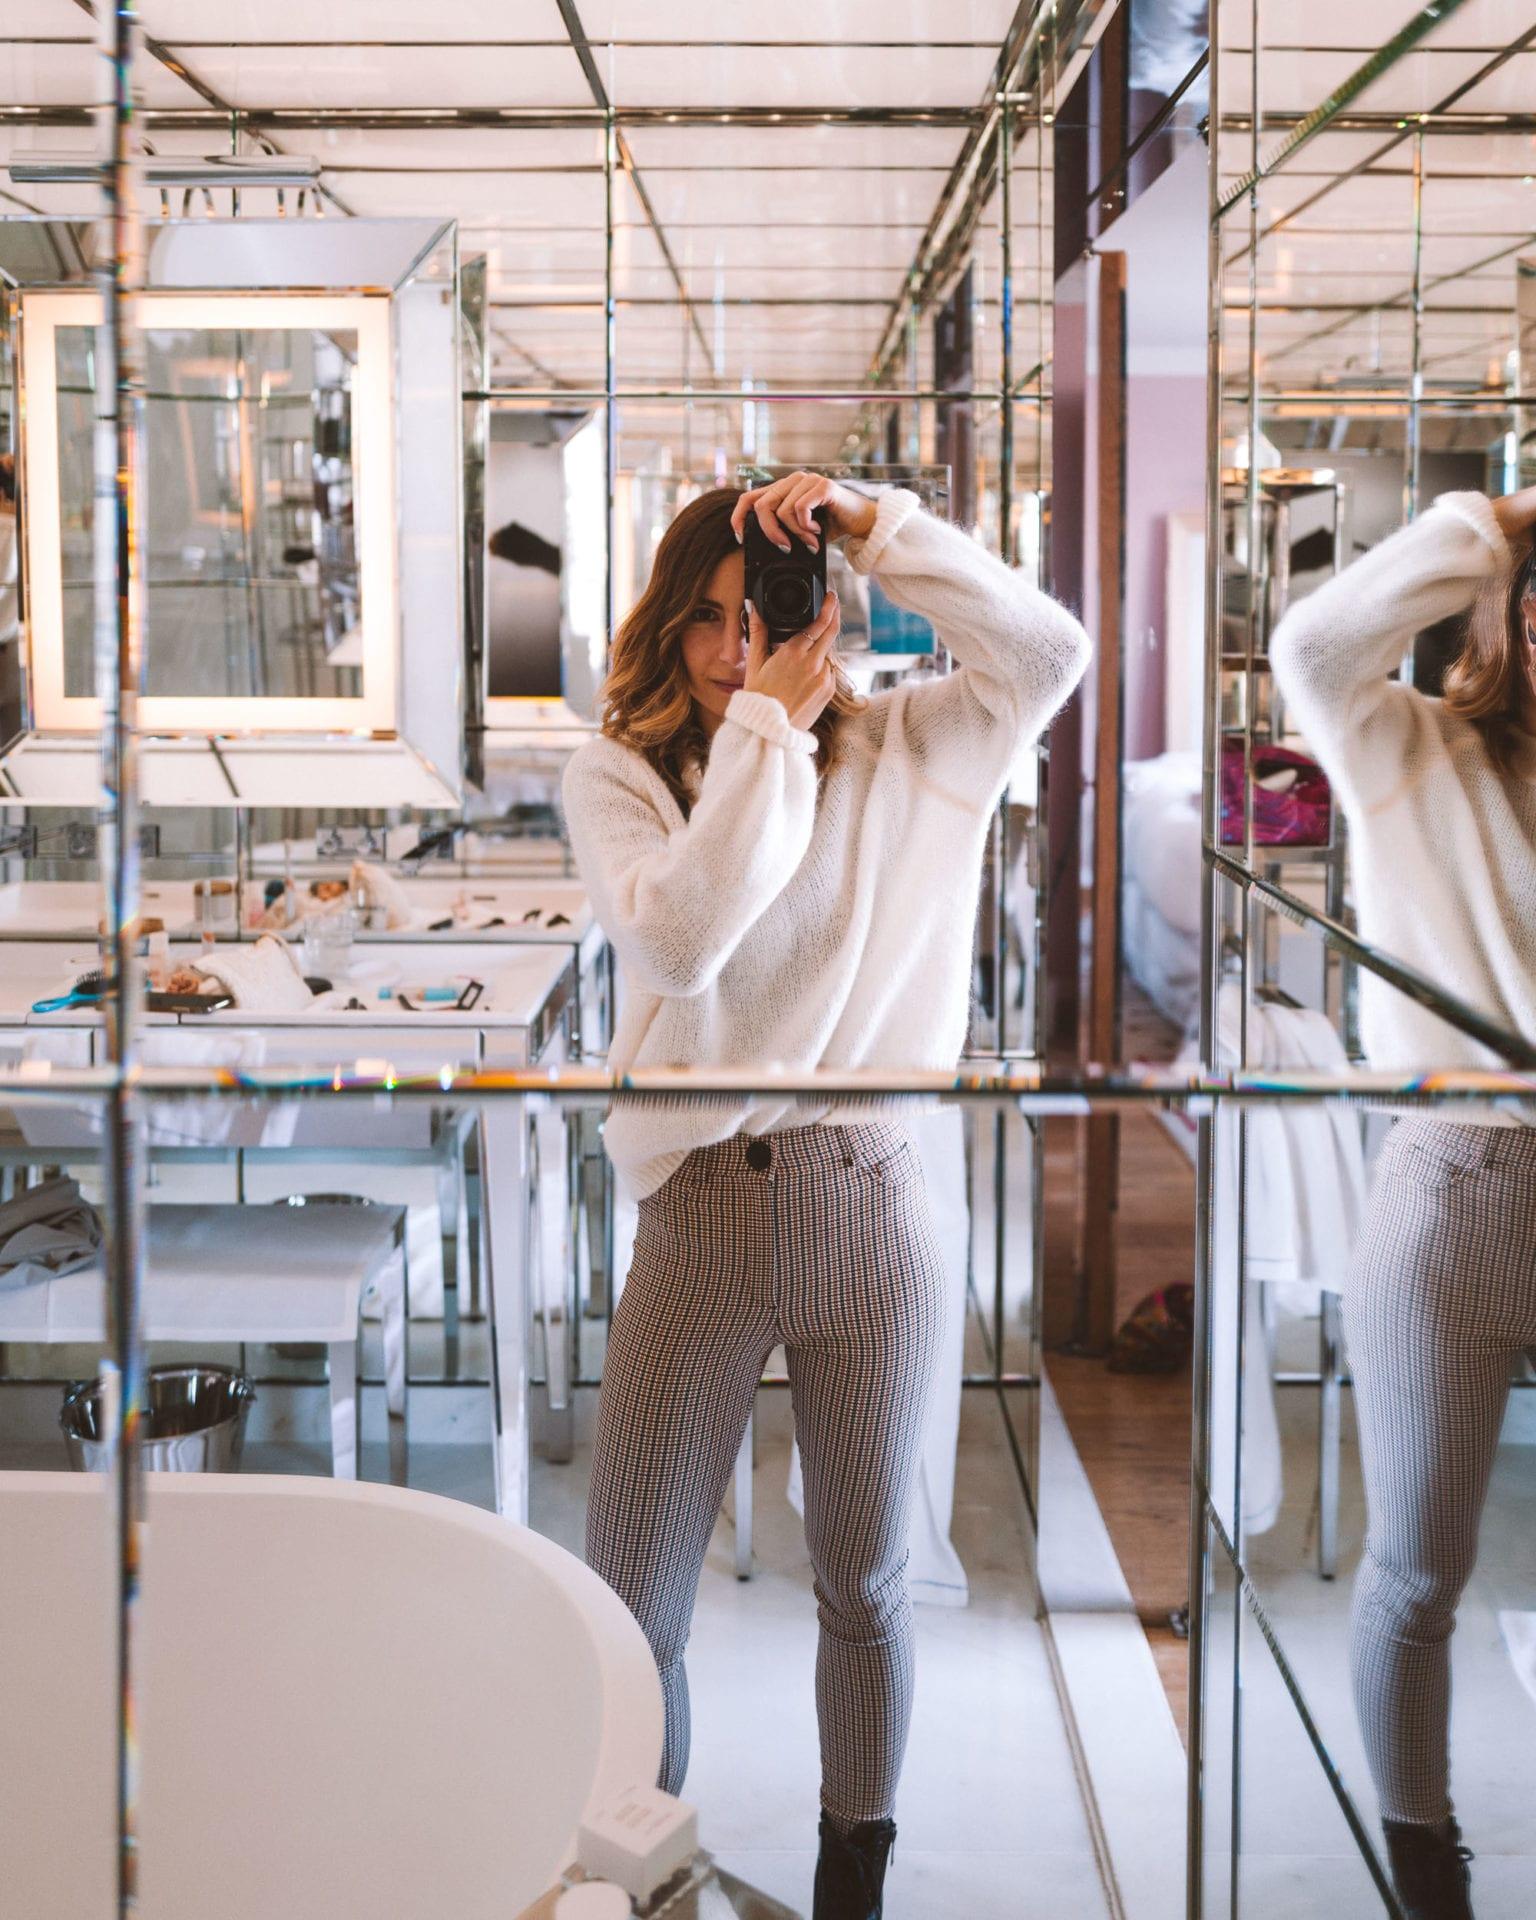 Mirrors in the bathroom at Le Royal Monceau Raffles Paris